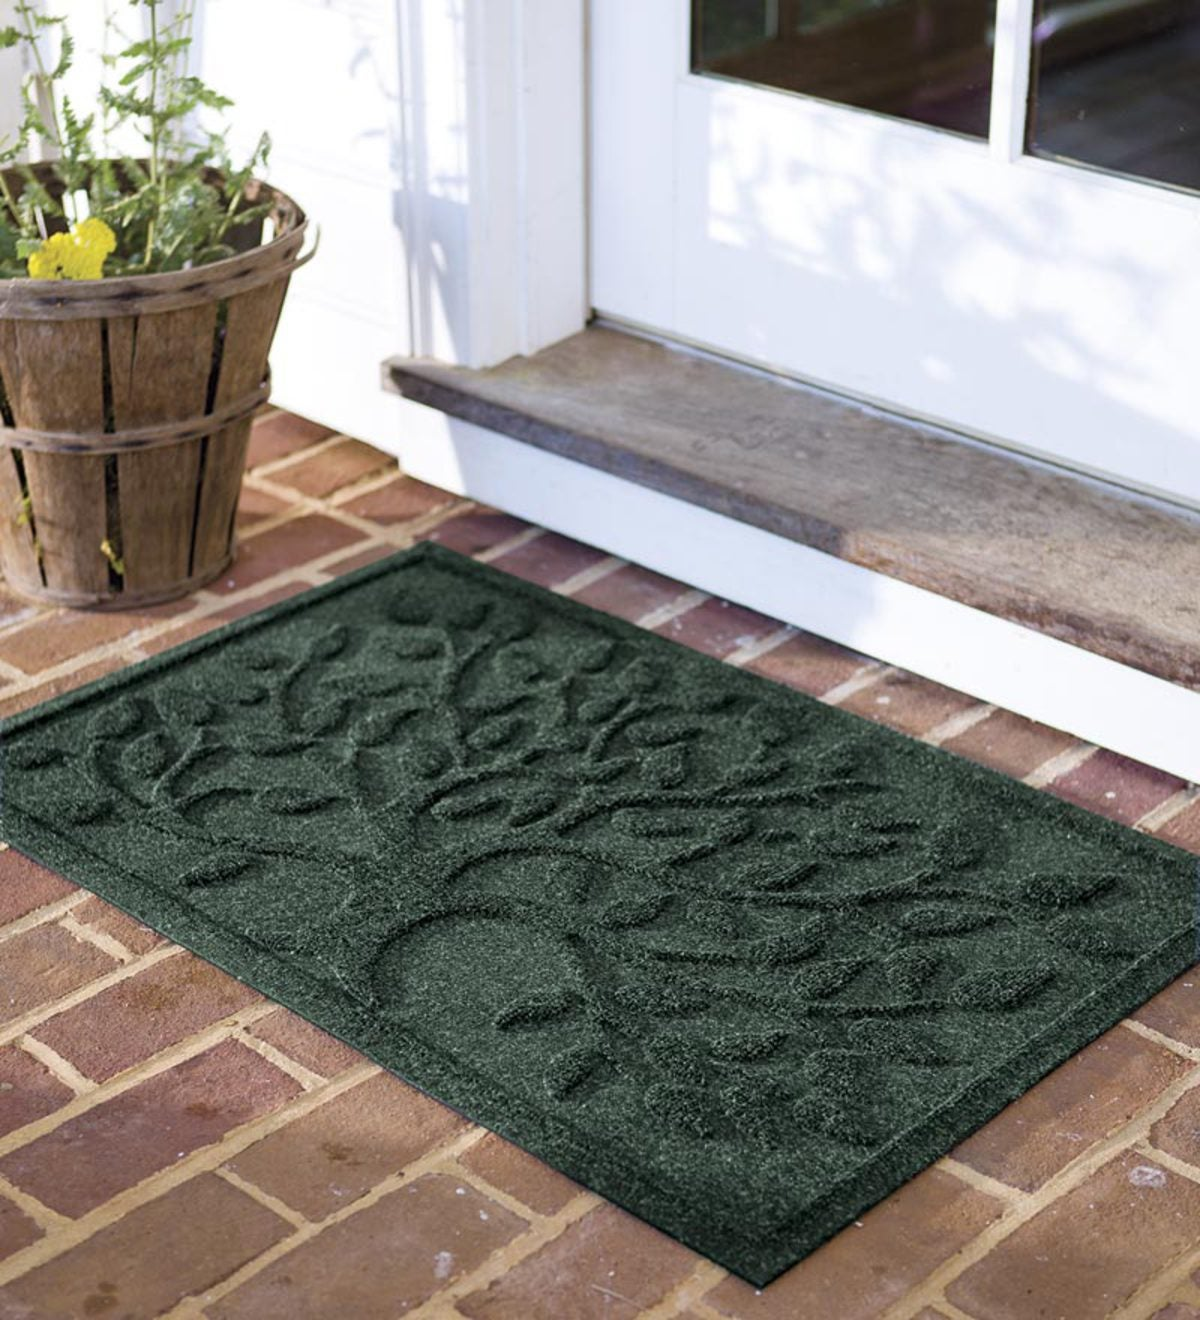 35 W X 58 L Tree Of Life Waterhog Doormat Large